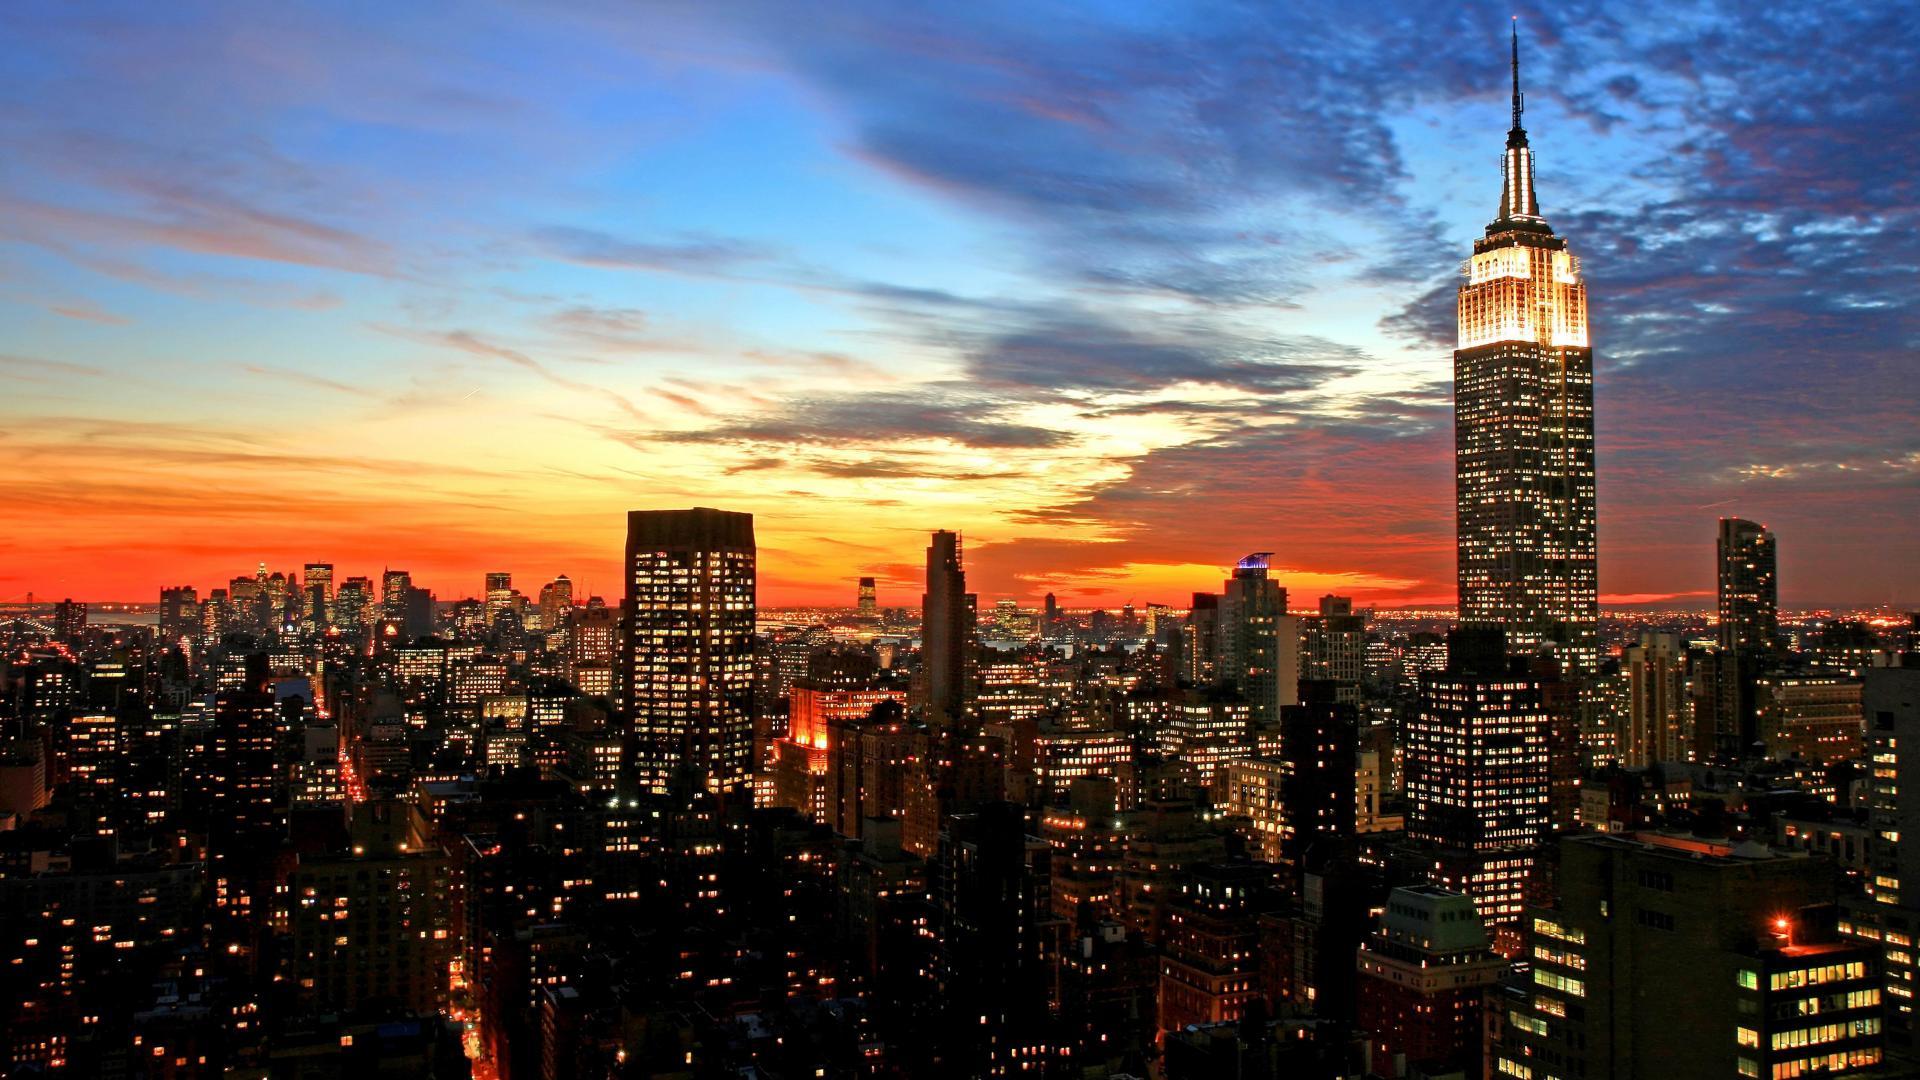 New York Hd Photo wallpaper hd